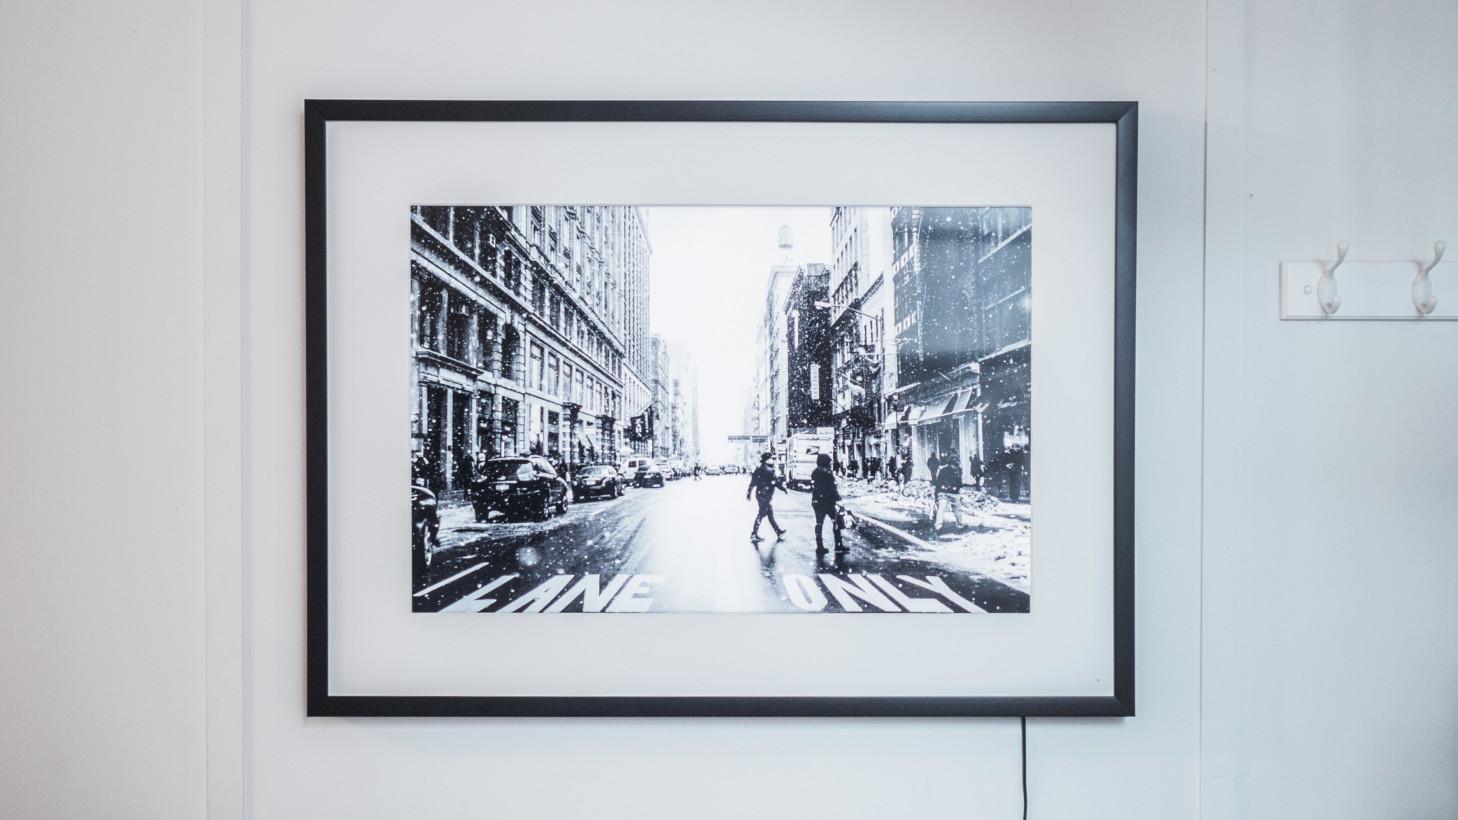 Memento smart frame review huge 4k photos that almost imitates print jeuxipadfo Images